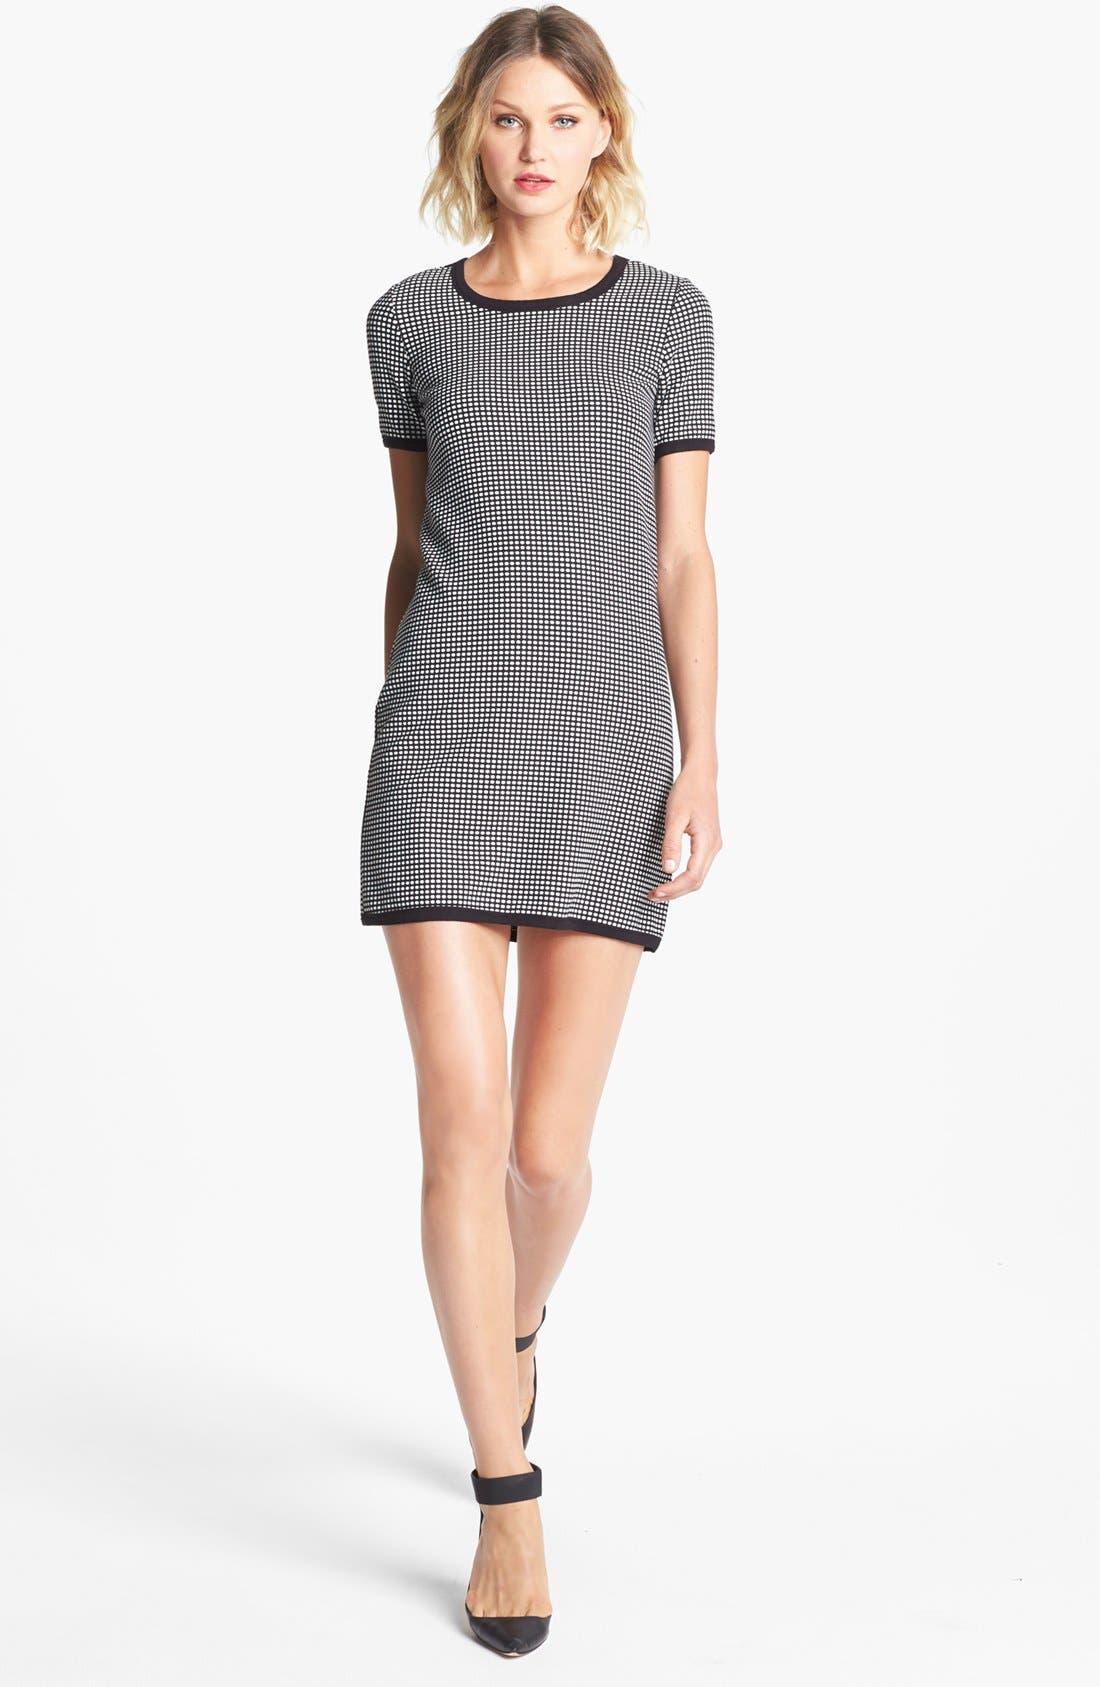 Alternate Image 1 Selected - Bailey 44 'Data Mining' Short Sleeve Dress